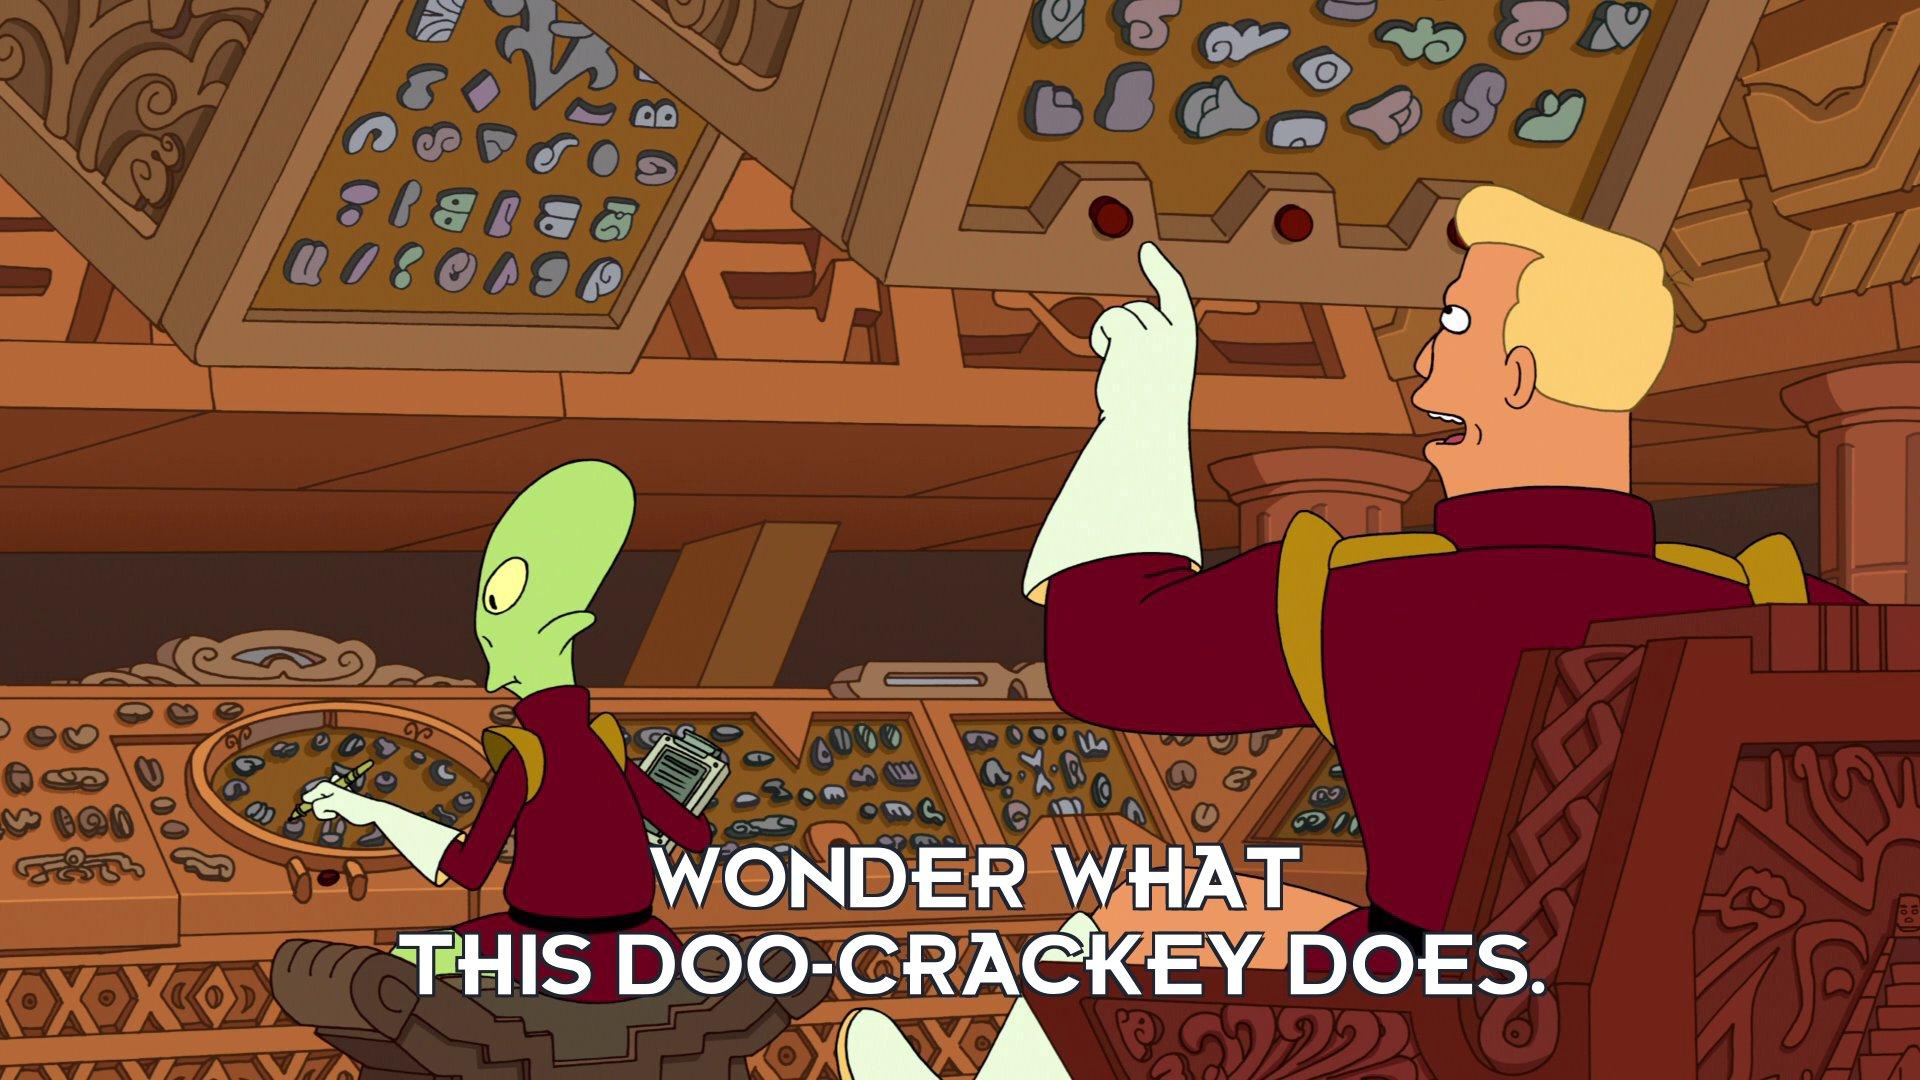 Zapp Brannigan: Wonder what this doo-crackey does.